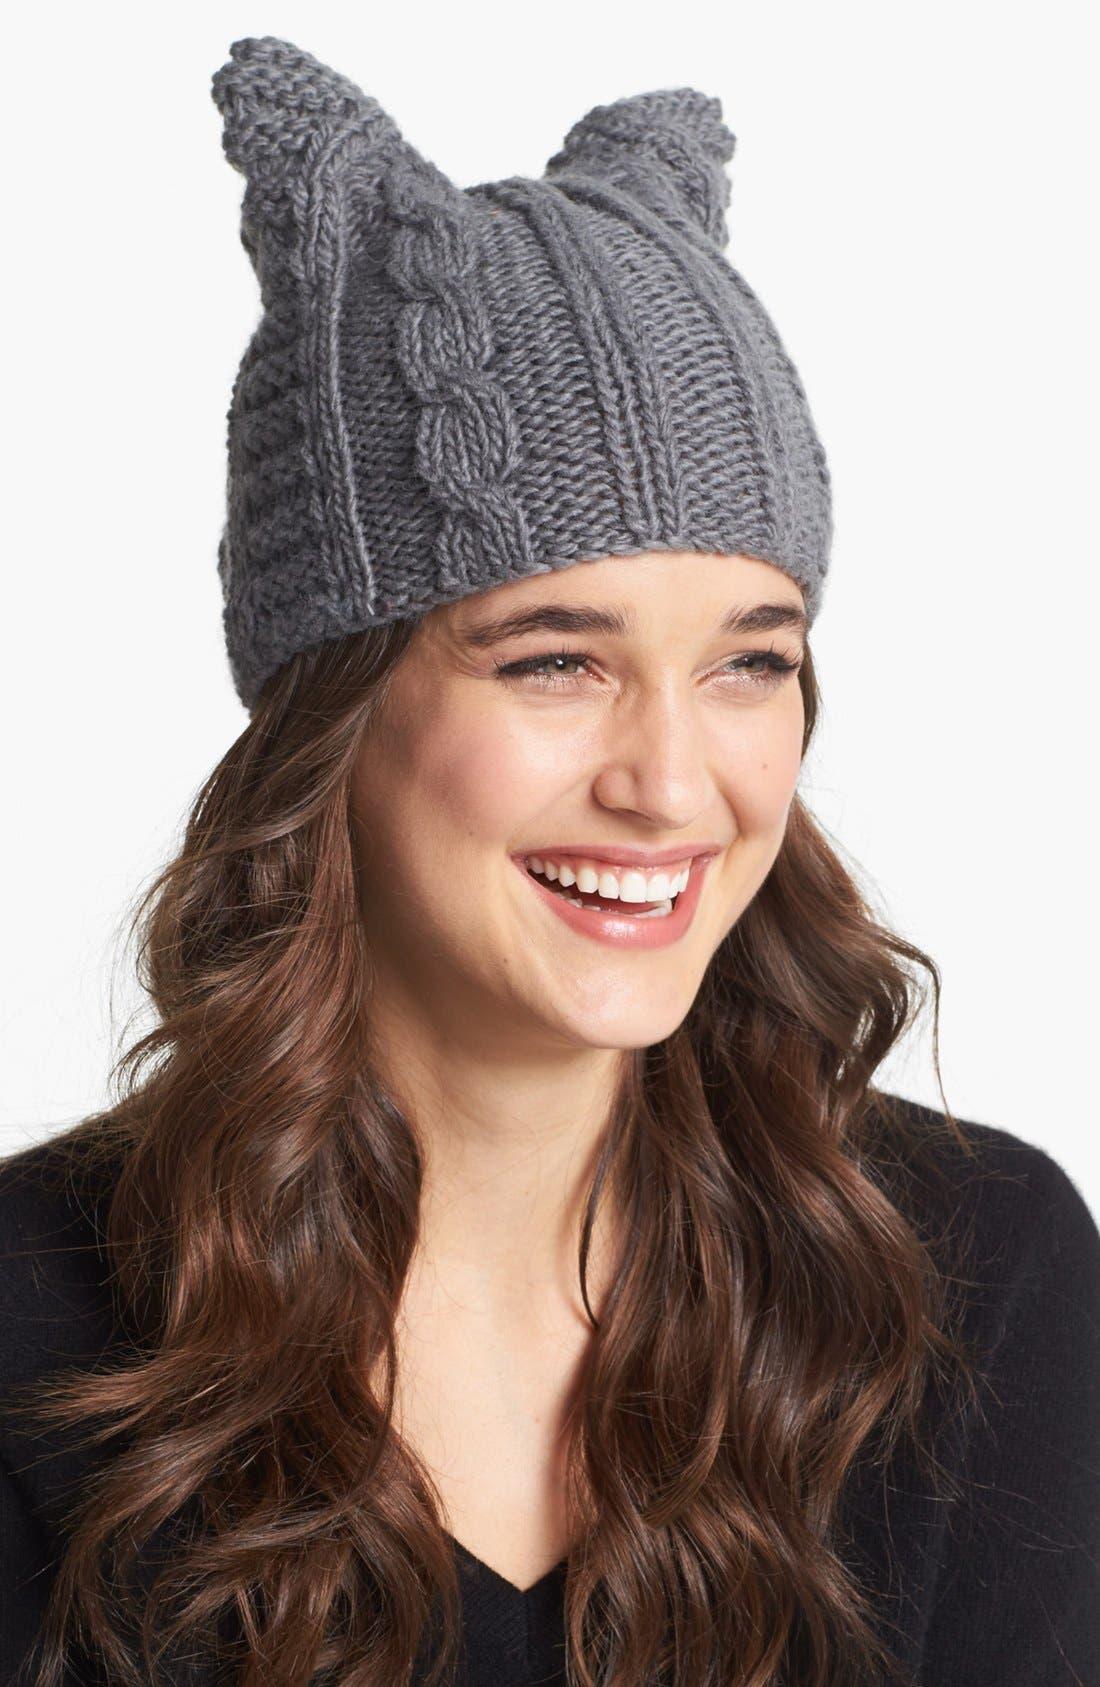 Alternate Image 1 Selected - August Hat Owl Ear Knit Cap